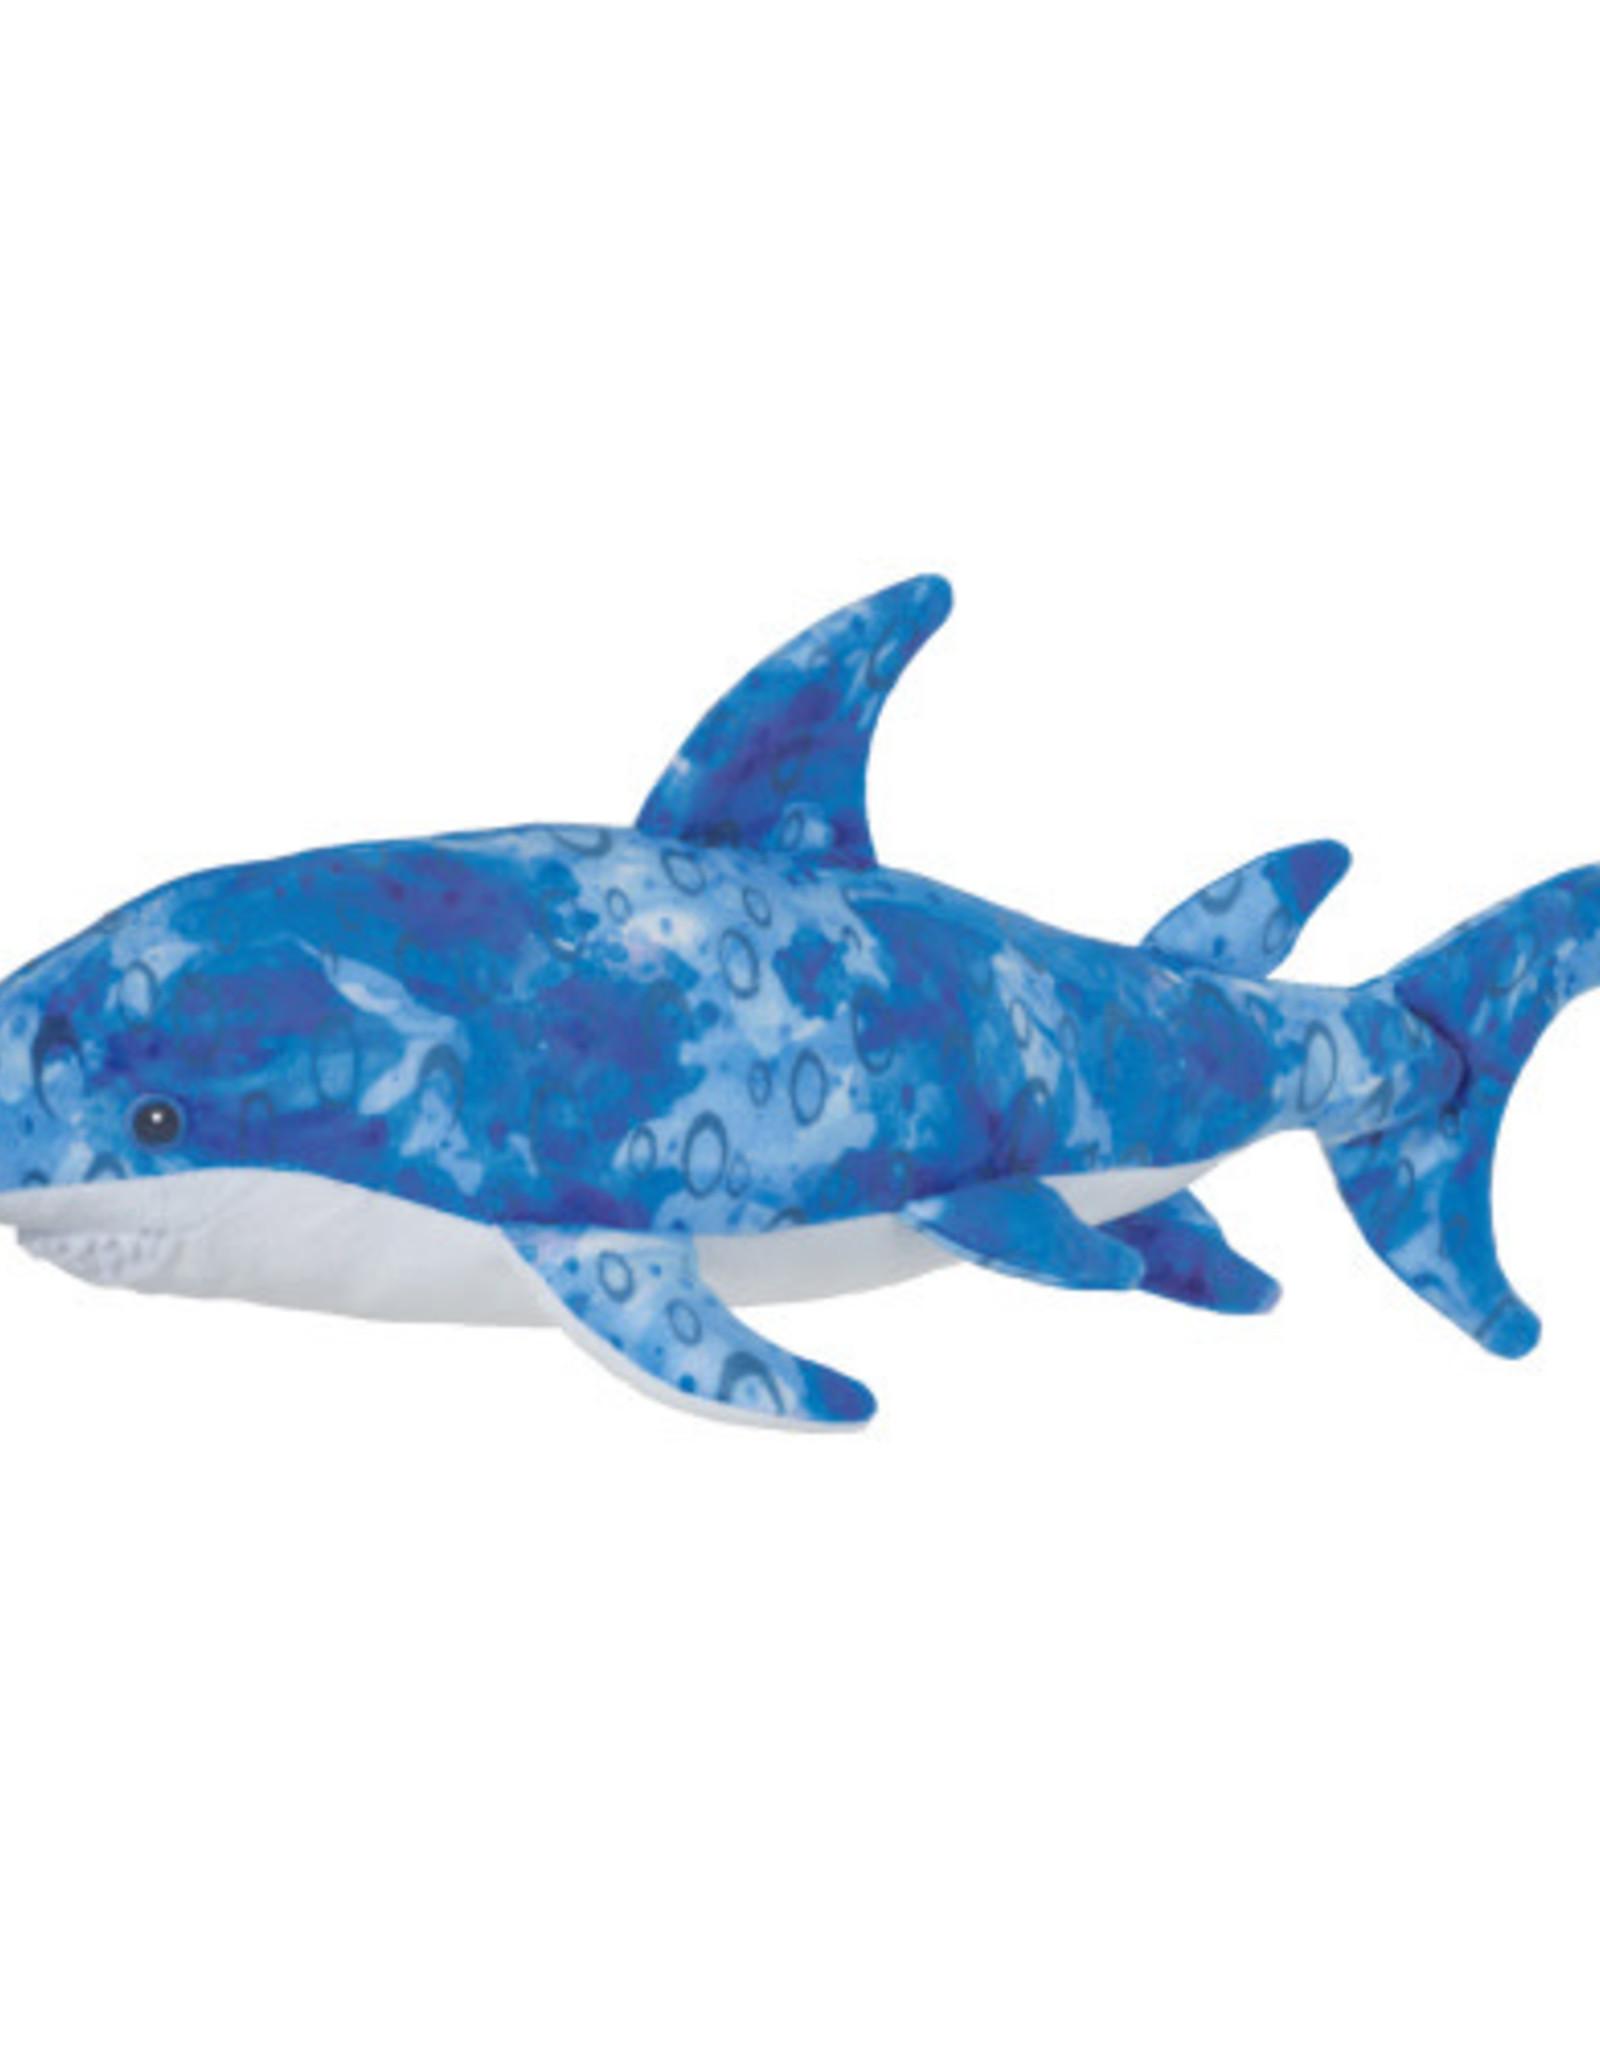 Douglas Reef Shark